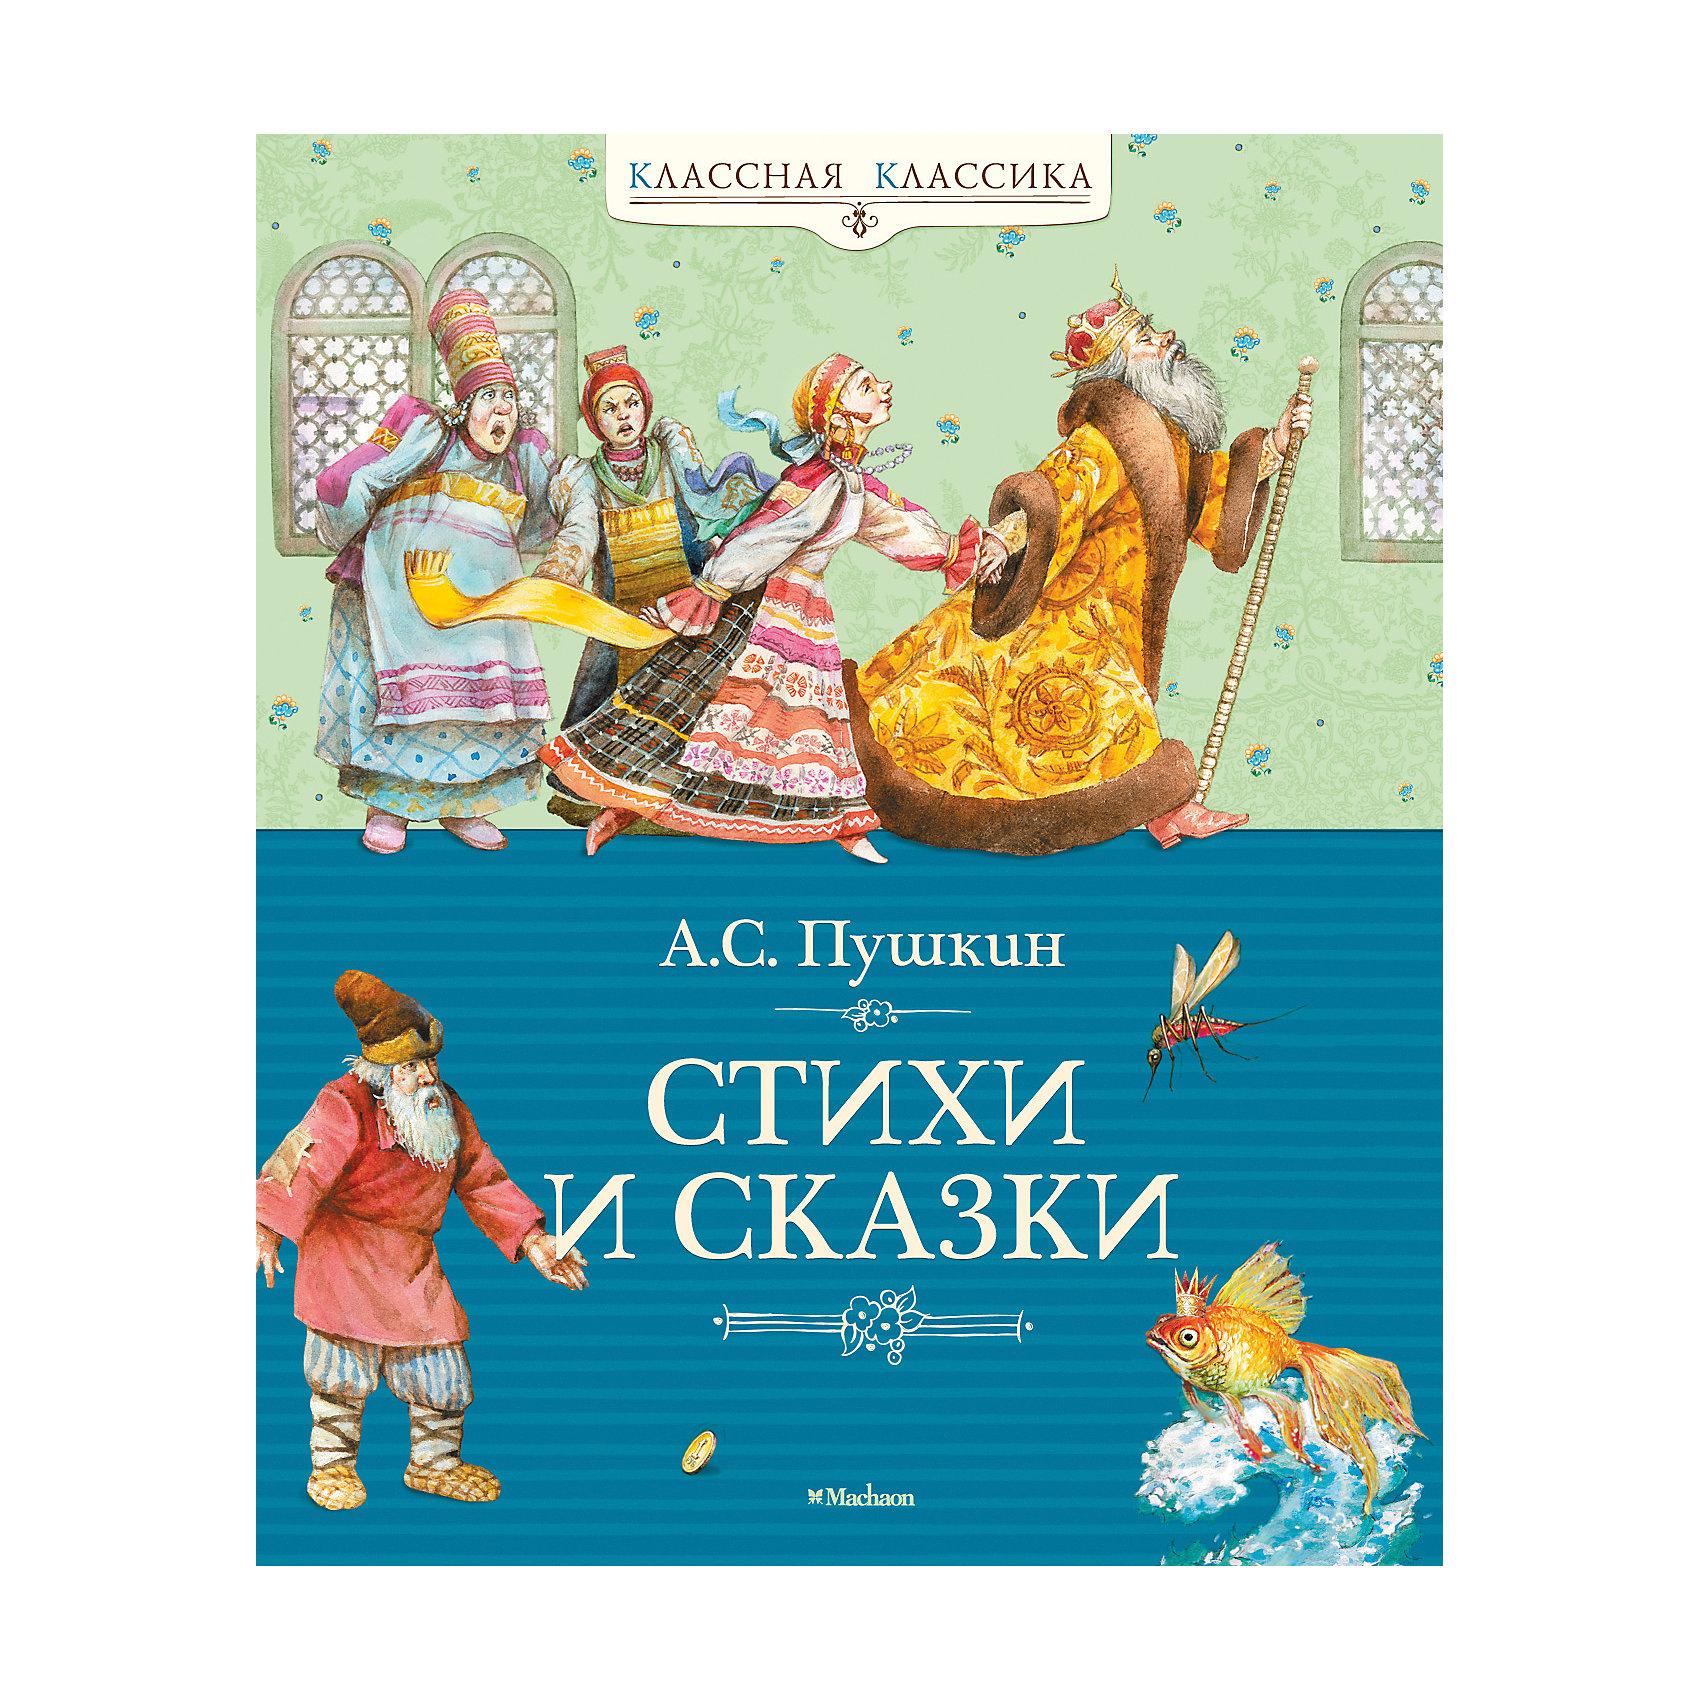 Стихи и сказки, А.С. Пушкин<br><br>Ширина мм: 255<br>Глубина мм: 195<br>Высота мм: 14<br>Вес г: 451<br>Возраст от месяцев: 36<br>Возраст до месяцев: 72<br>Пол: Унисекс<br>Возраст: Детский<br>SKU: 4587262